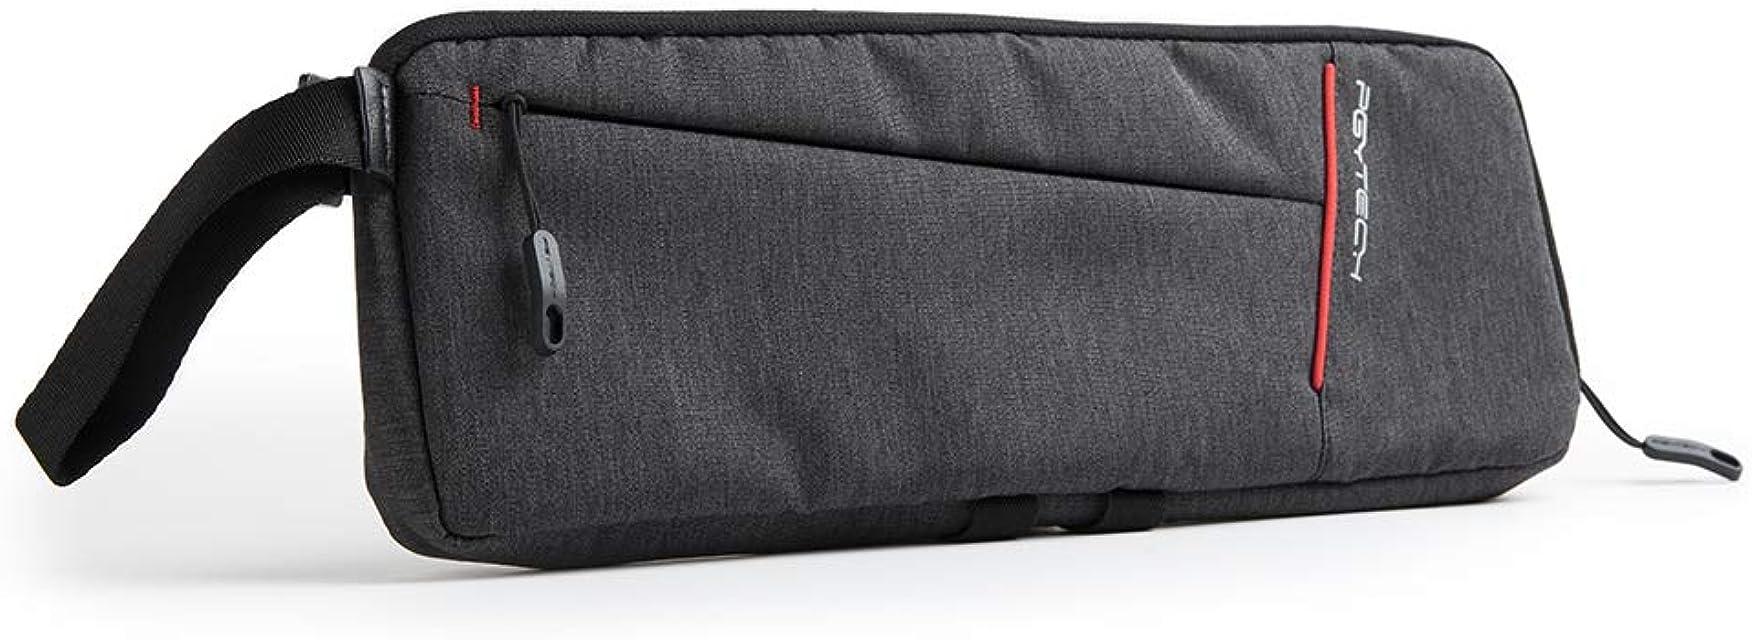 RC GearPro Waterproof Gimbal Mobile Pocket Carry Bag para dji OSMO Mobile 2 Zhiyun Smooth 4 Feiyu Smartphone Gimbal de Mano